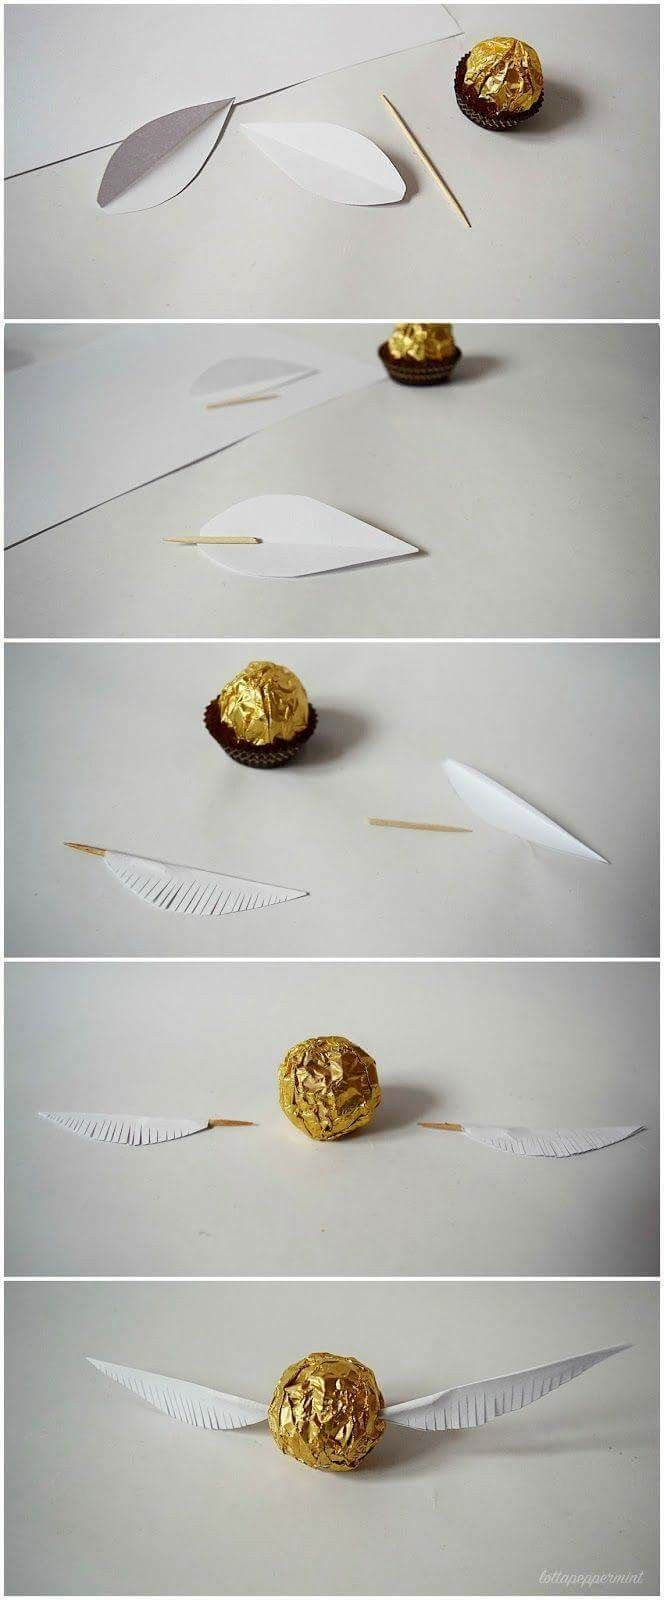 Golden Snitch using Ferrero Roche chocolates!! Love this idea for Halloween or a future bday party idea for Zuzu!